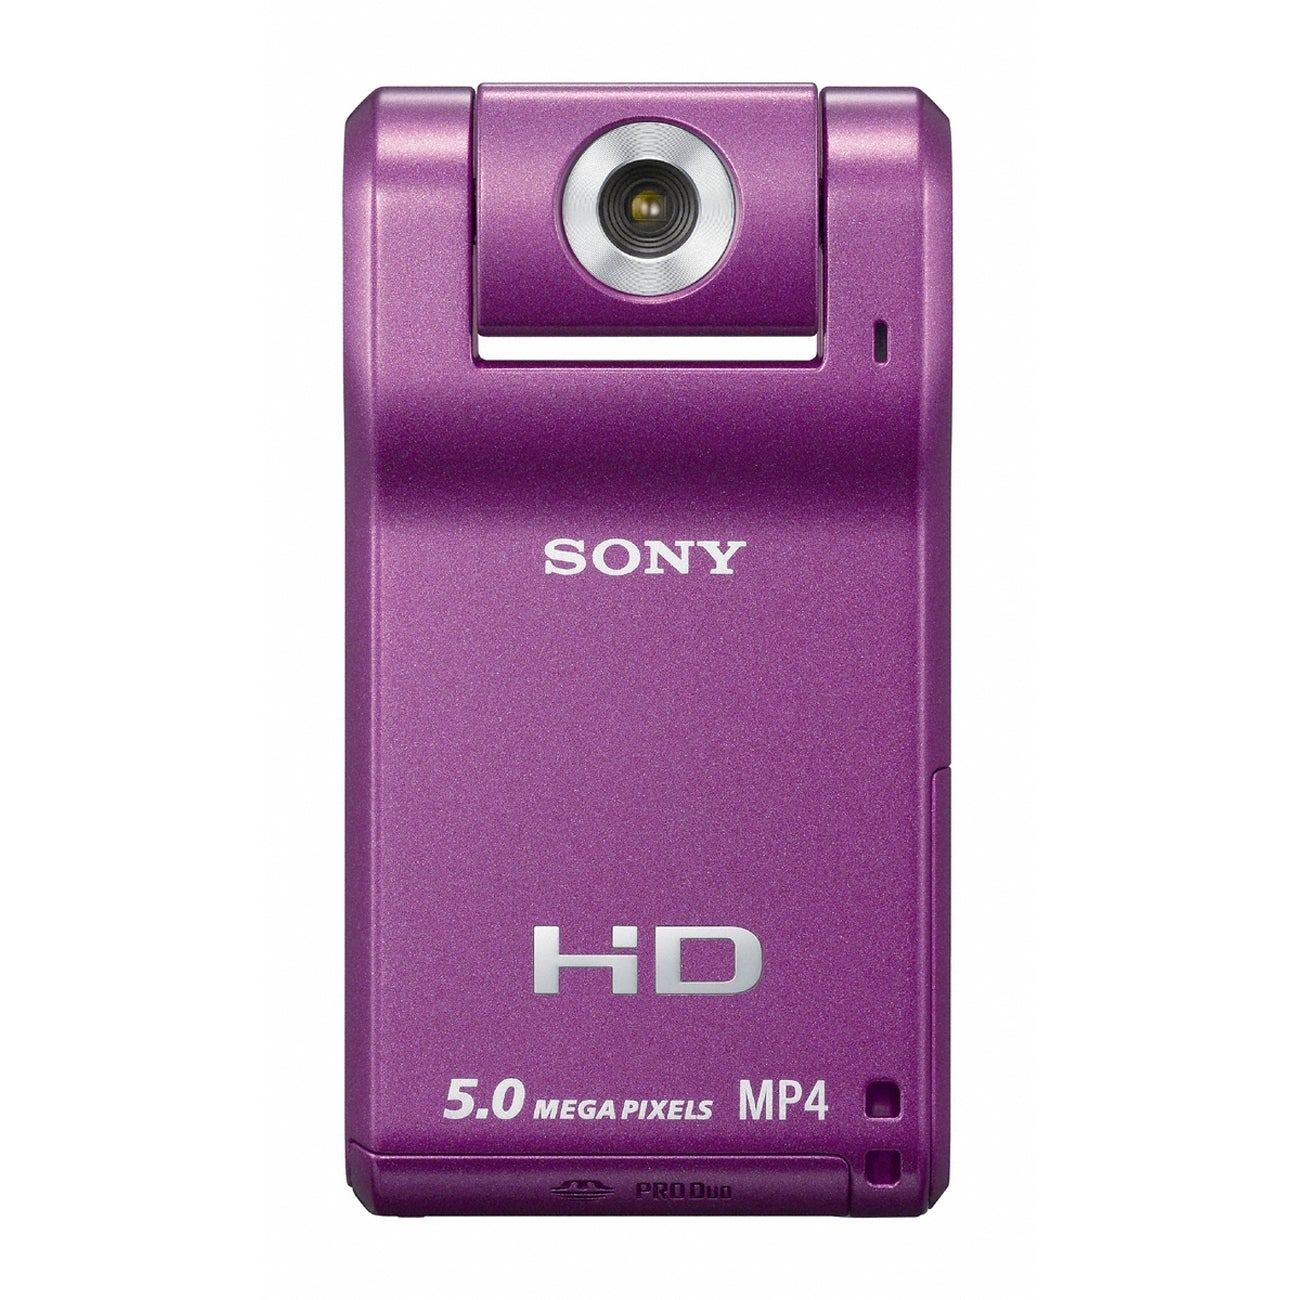 Sony Webbie HD MHS-PM1 Eggplant Digital Camcorder